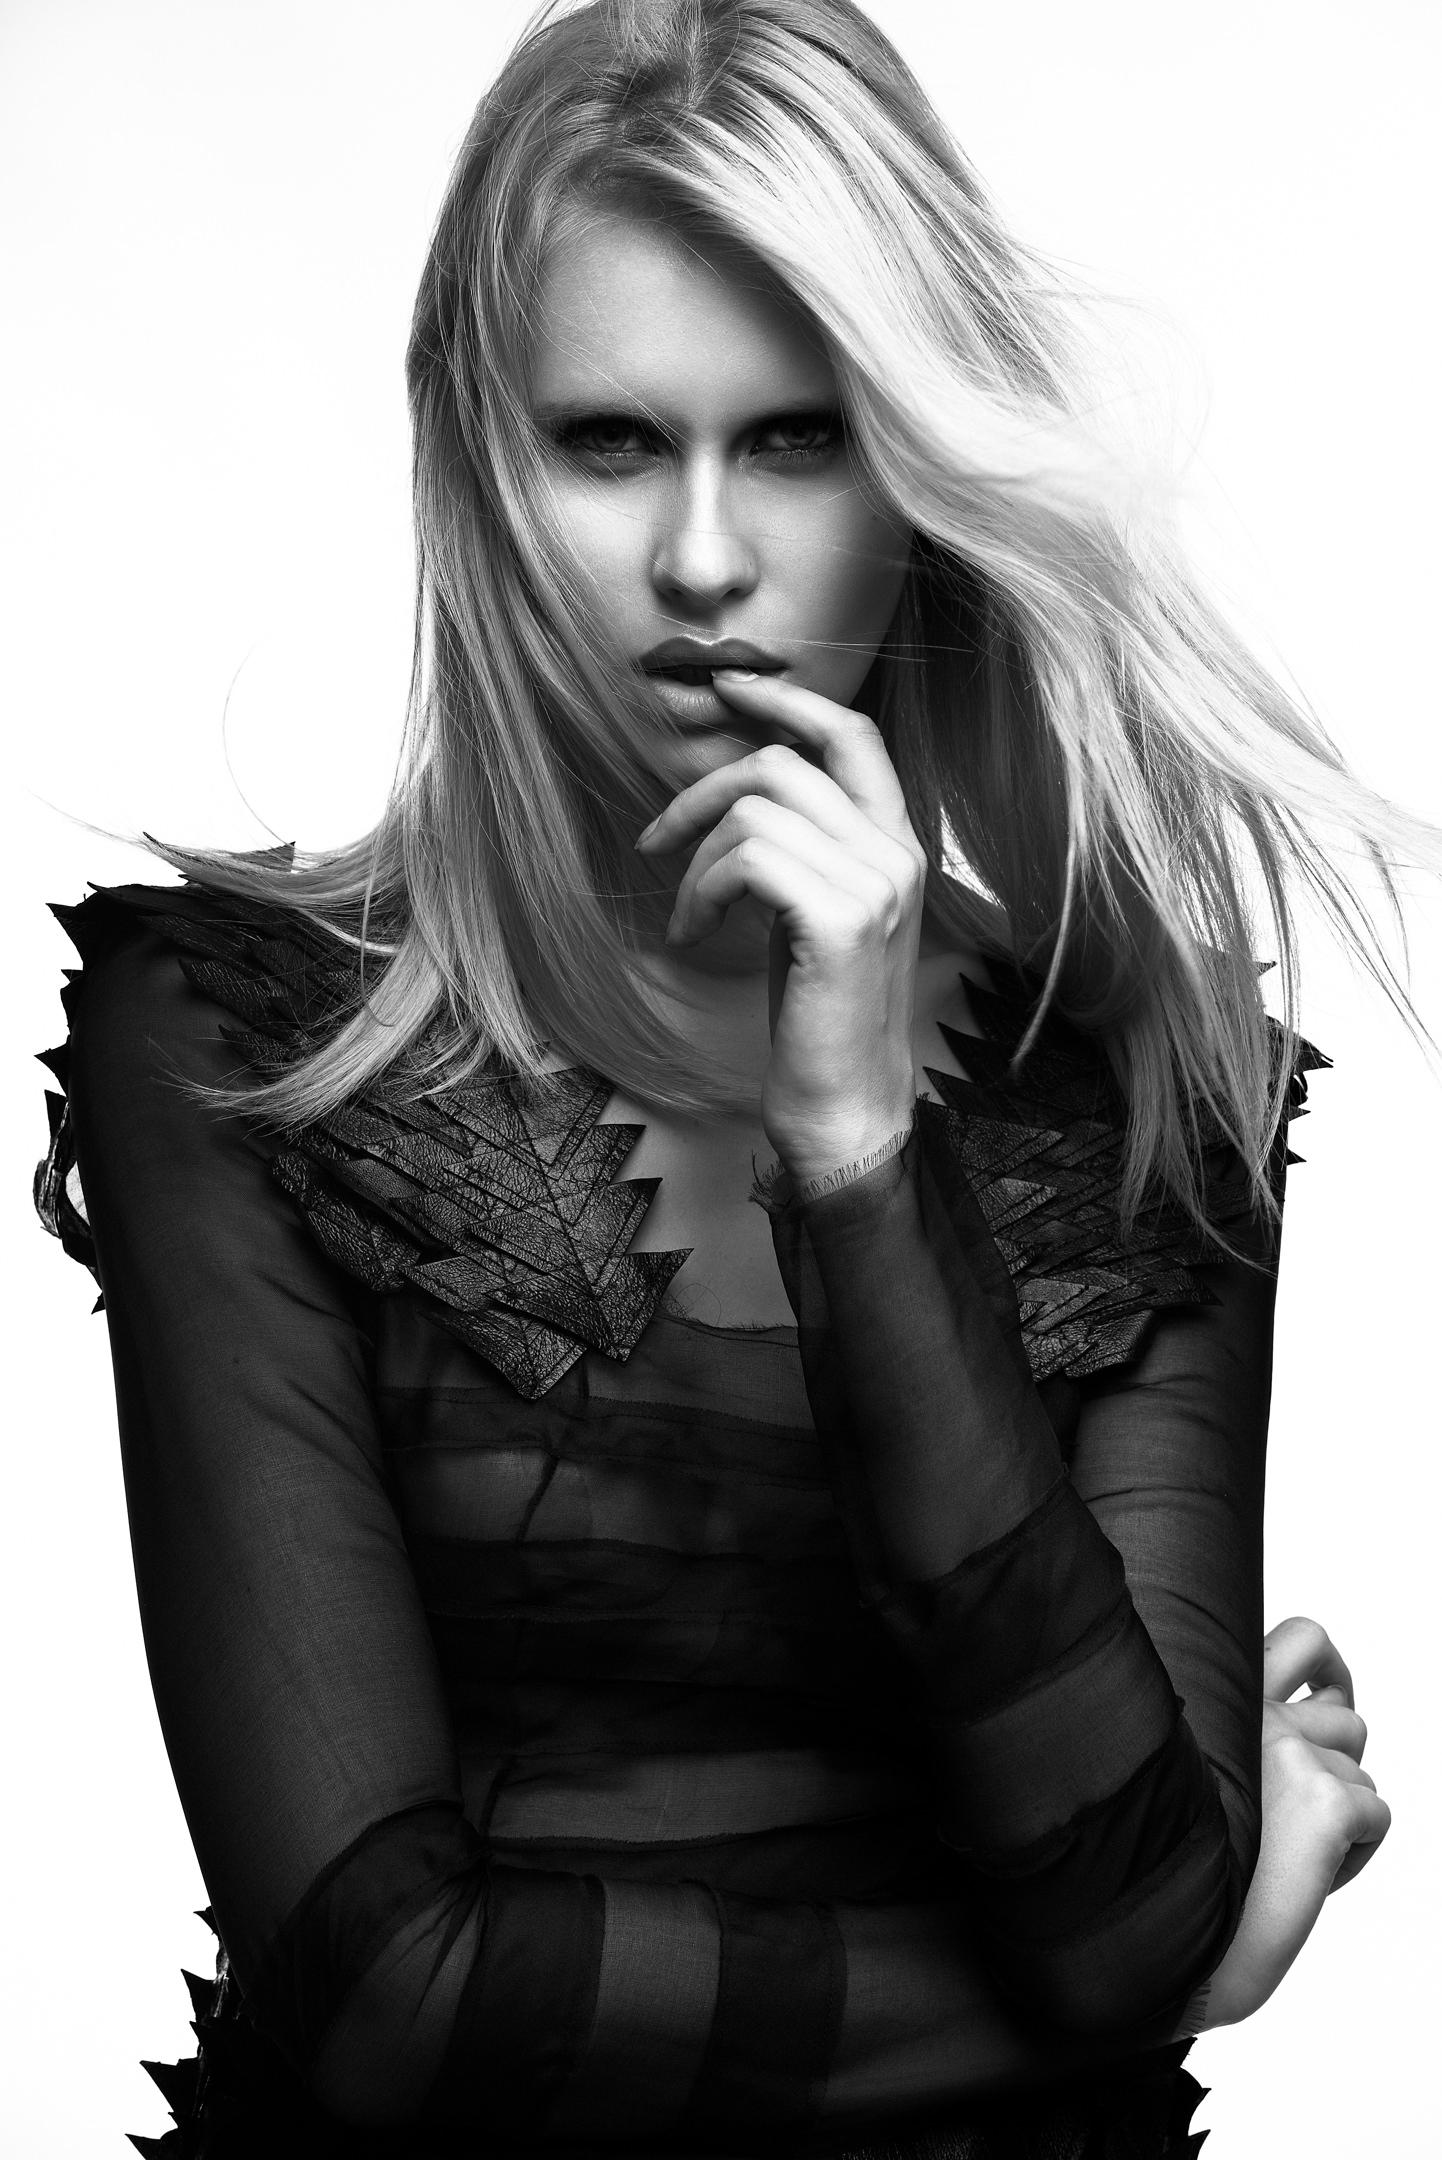 Maleficent-by-ANNA-BAZHANOVA-dh-13